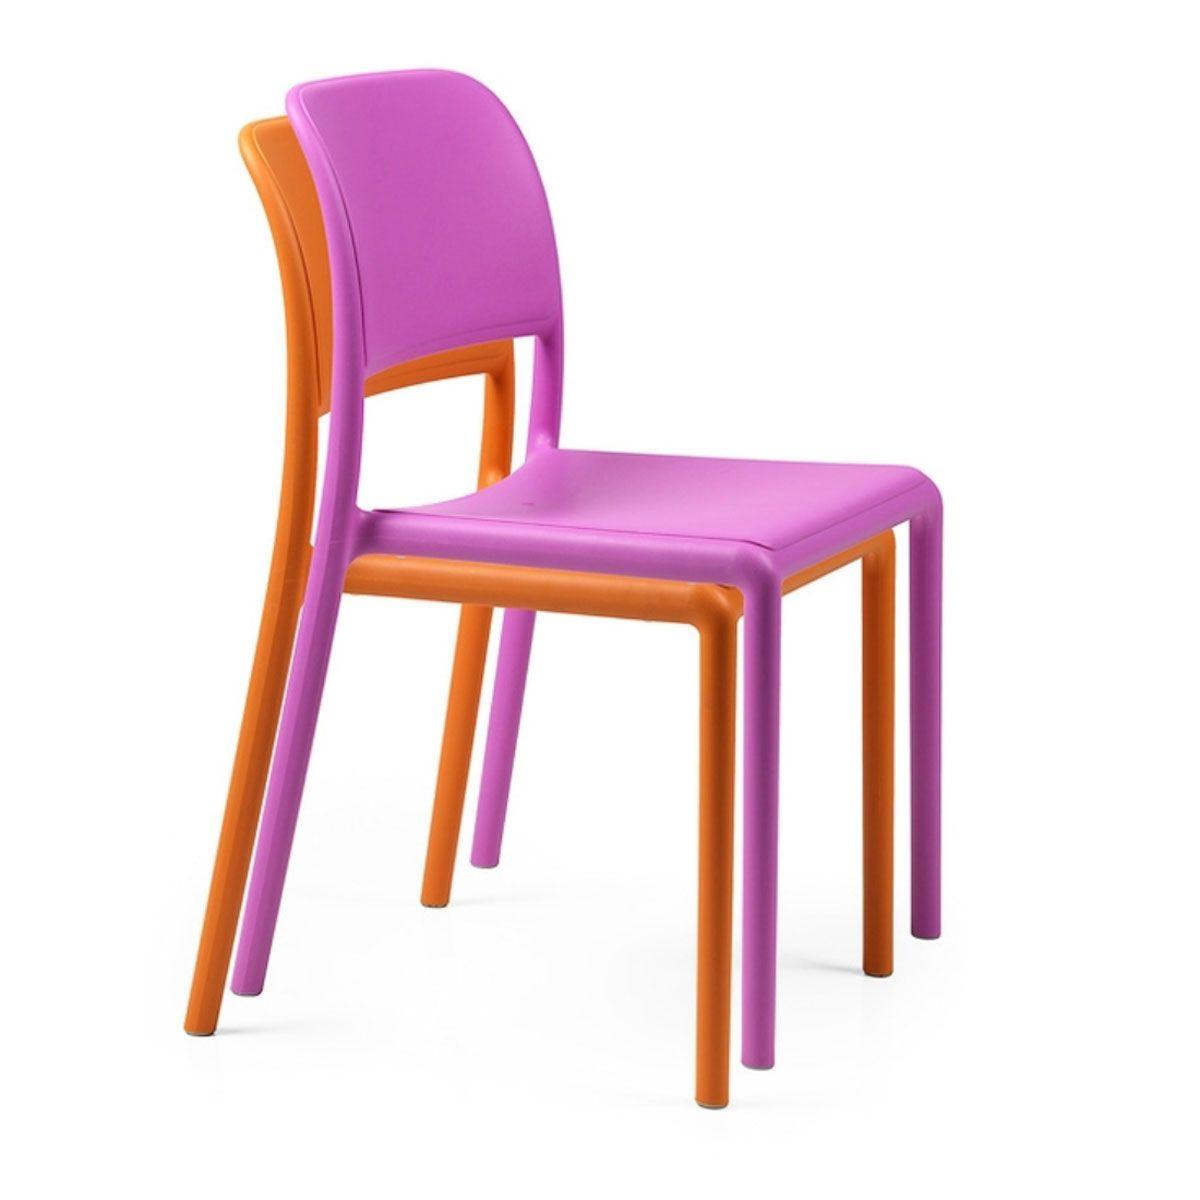 Chaise de jardin colorée Riva Bistrot Nardi Zendart Design